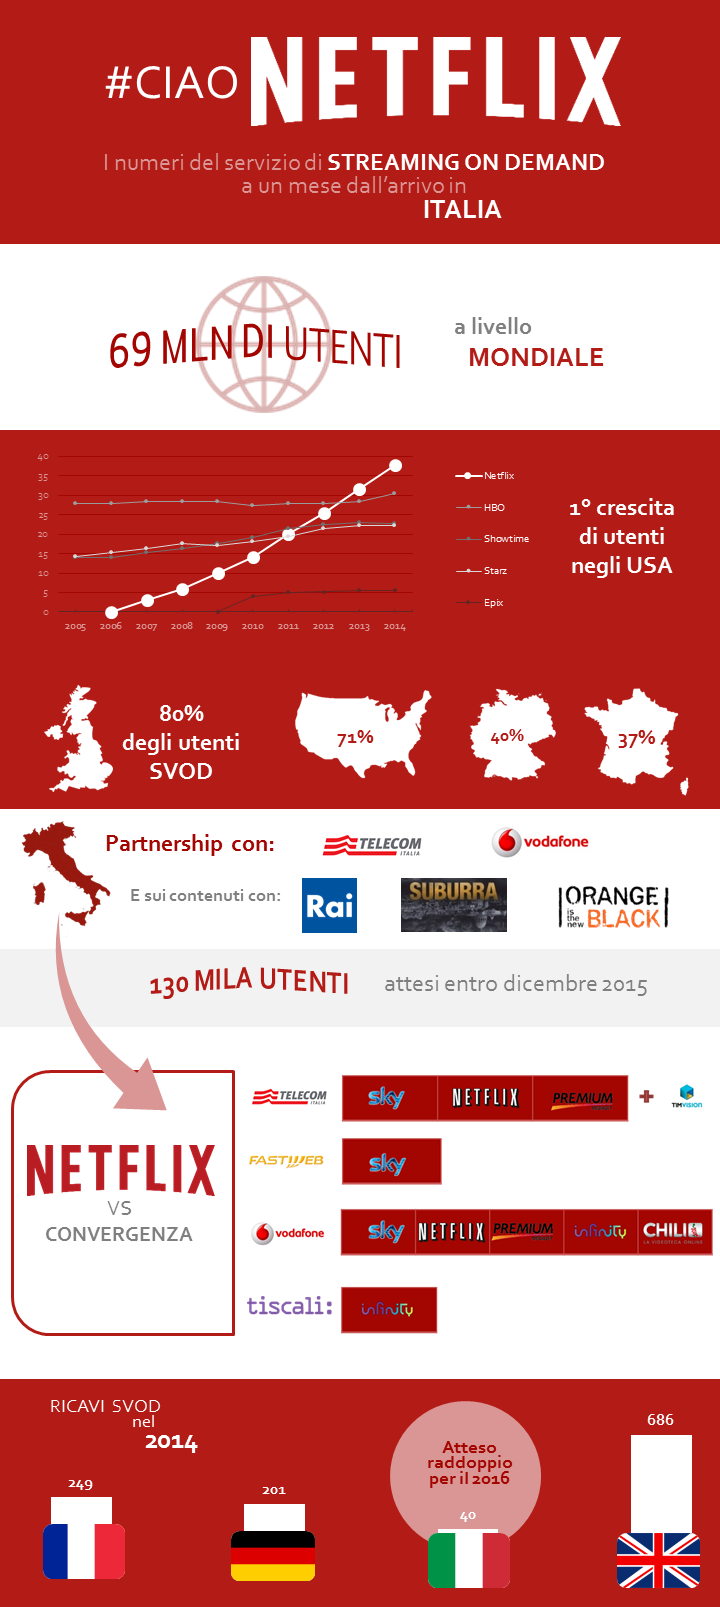 netflix un mese in italia infografica